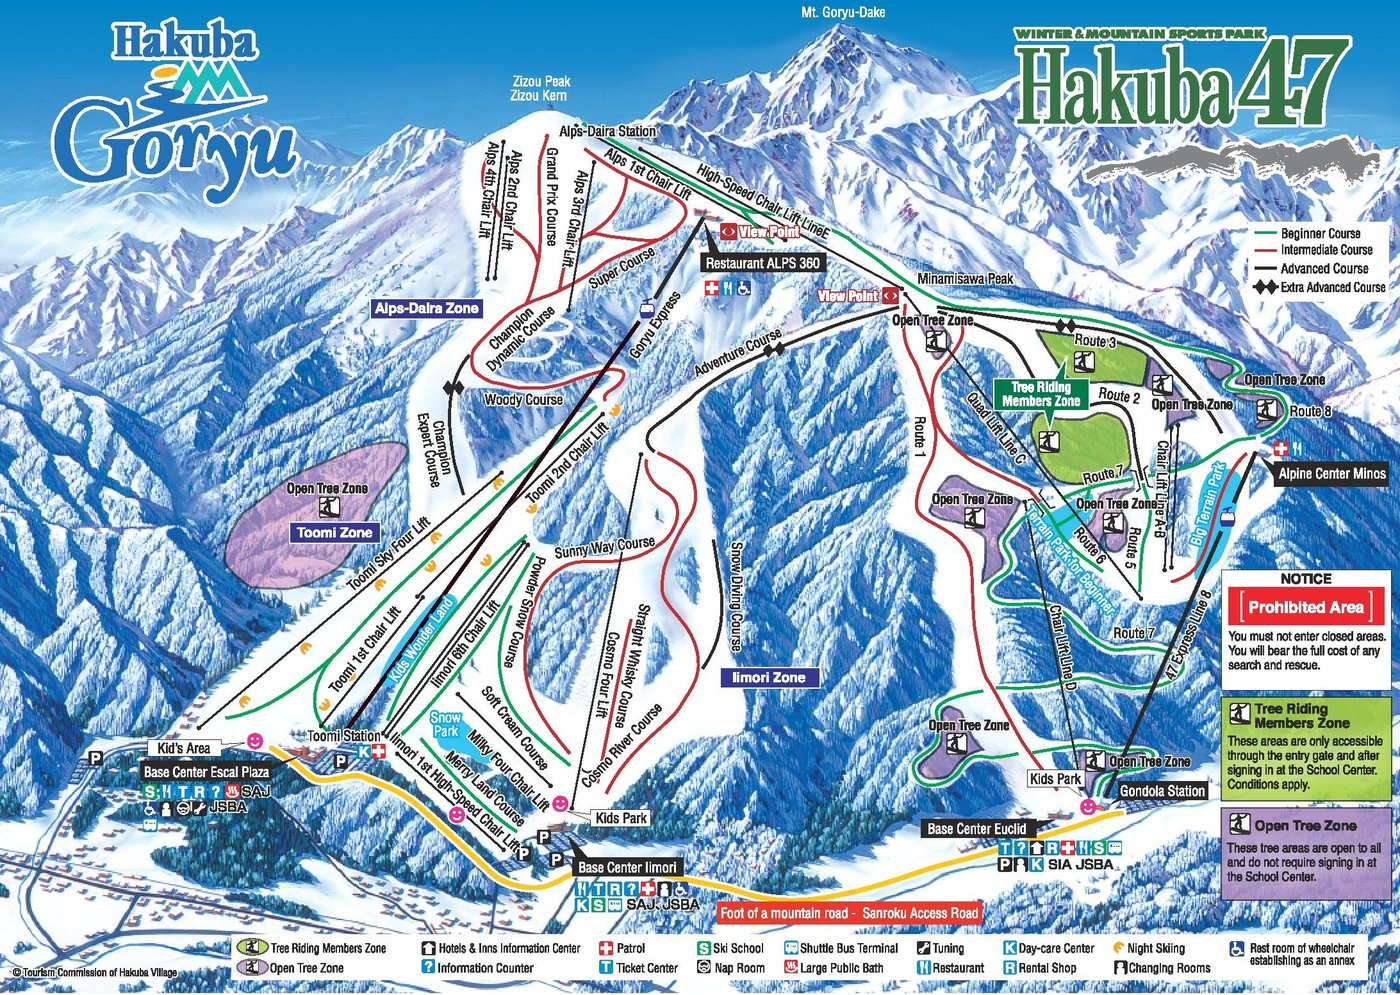 Hakuba 47 & Goryu Trail Map